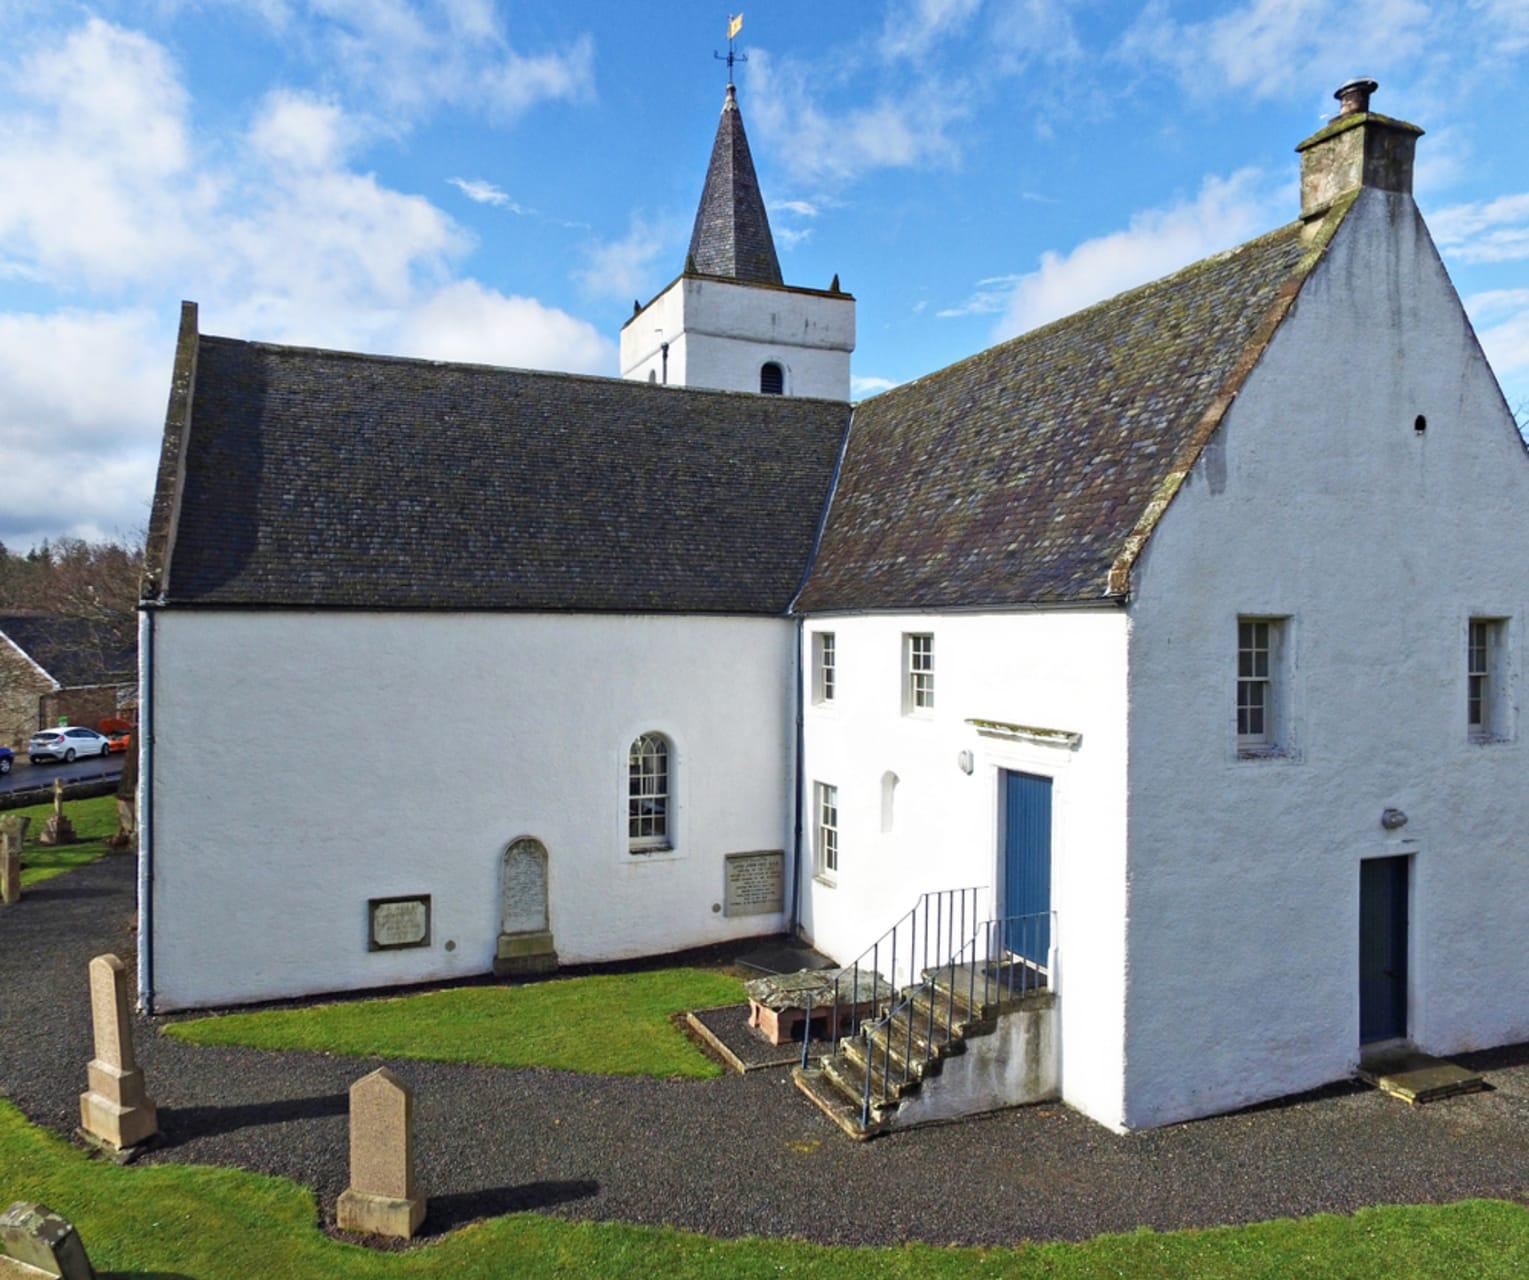 East Lothian - Gifford an East Lothian hidden gem